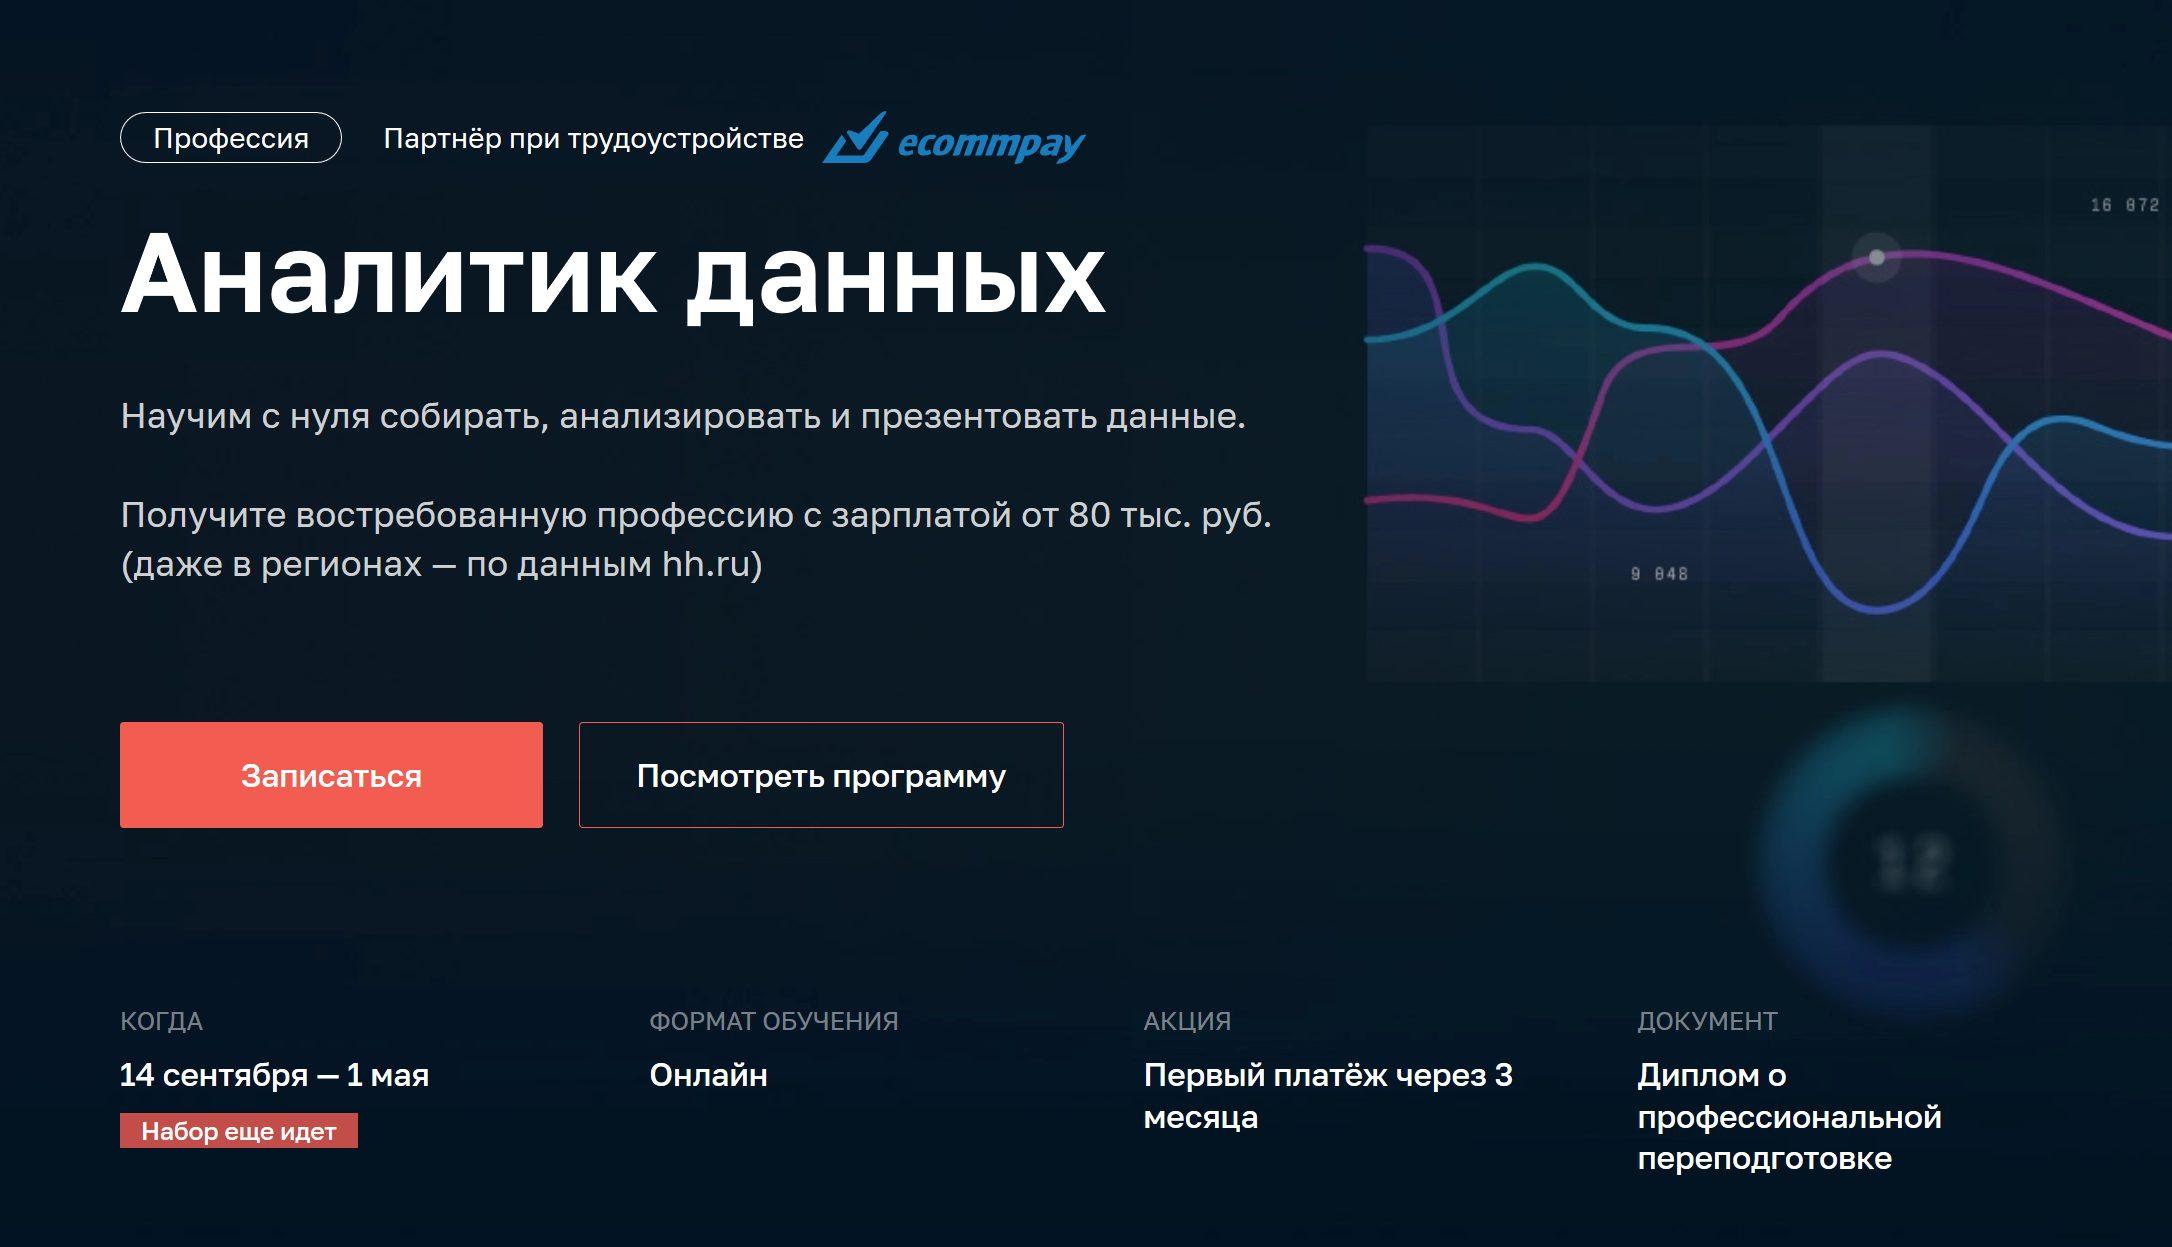 Аналитик данных – обучение с нуля на онлайн курсе в Нетологии. - Mozilla Firefox